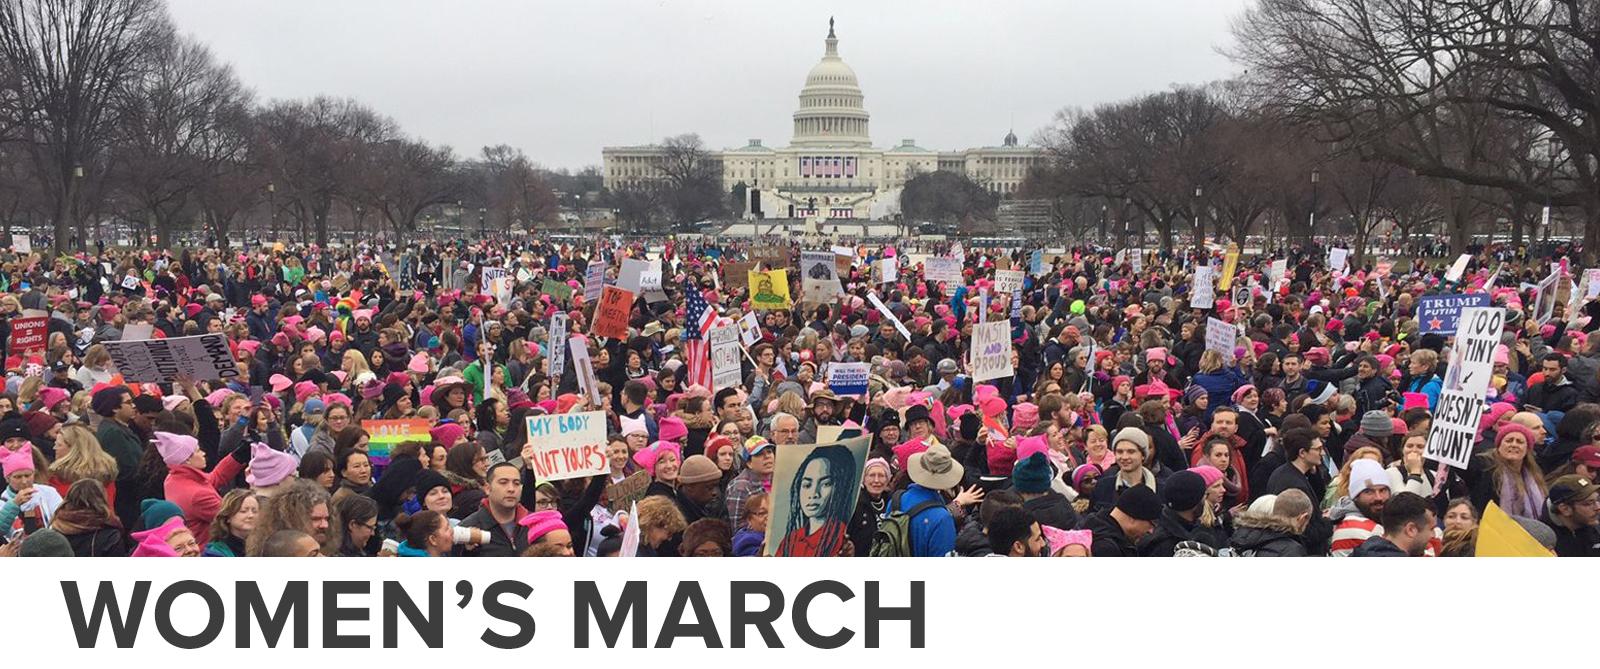 Women s March on Washington: News, Videos and Photos-ABC News